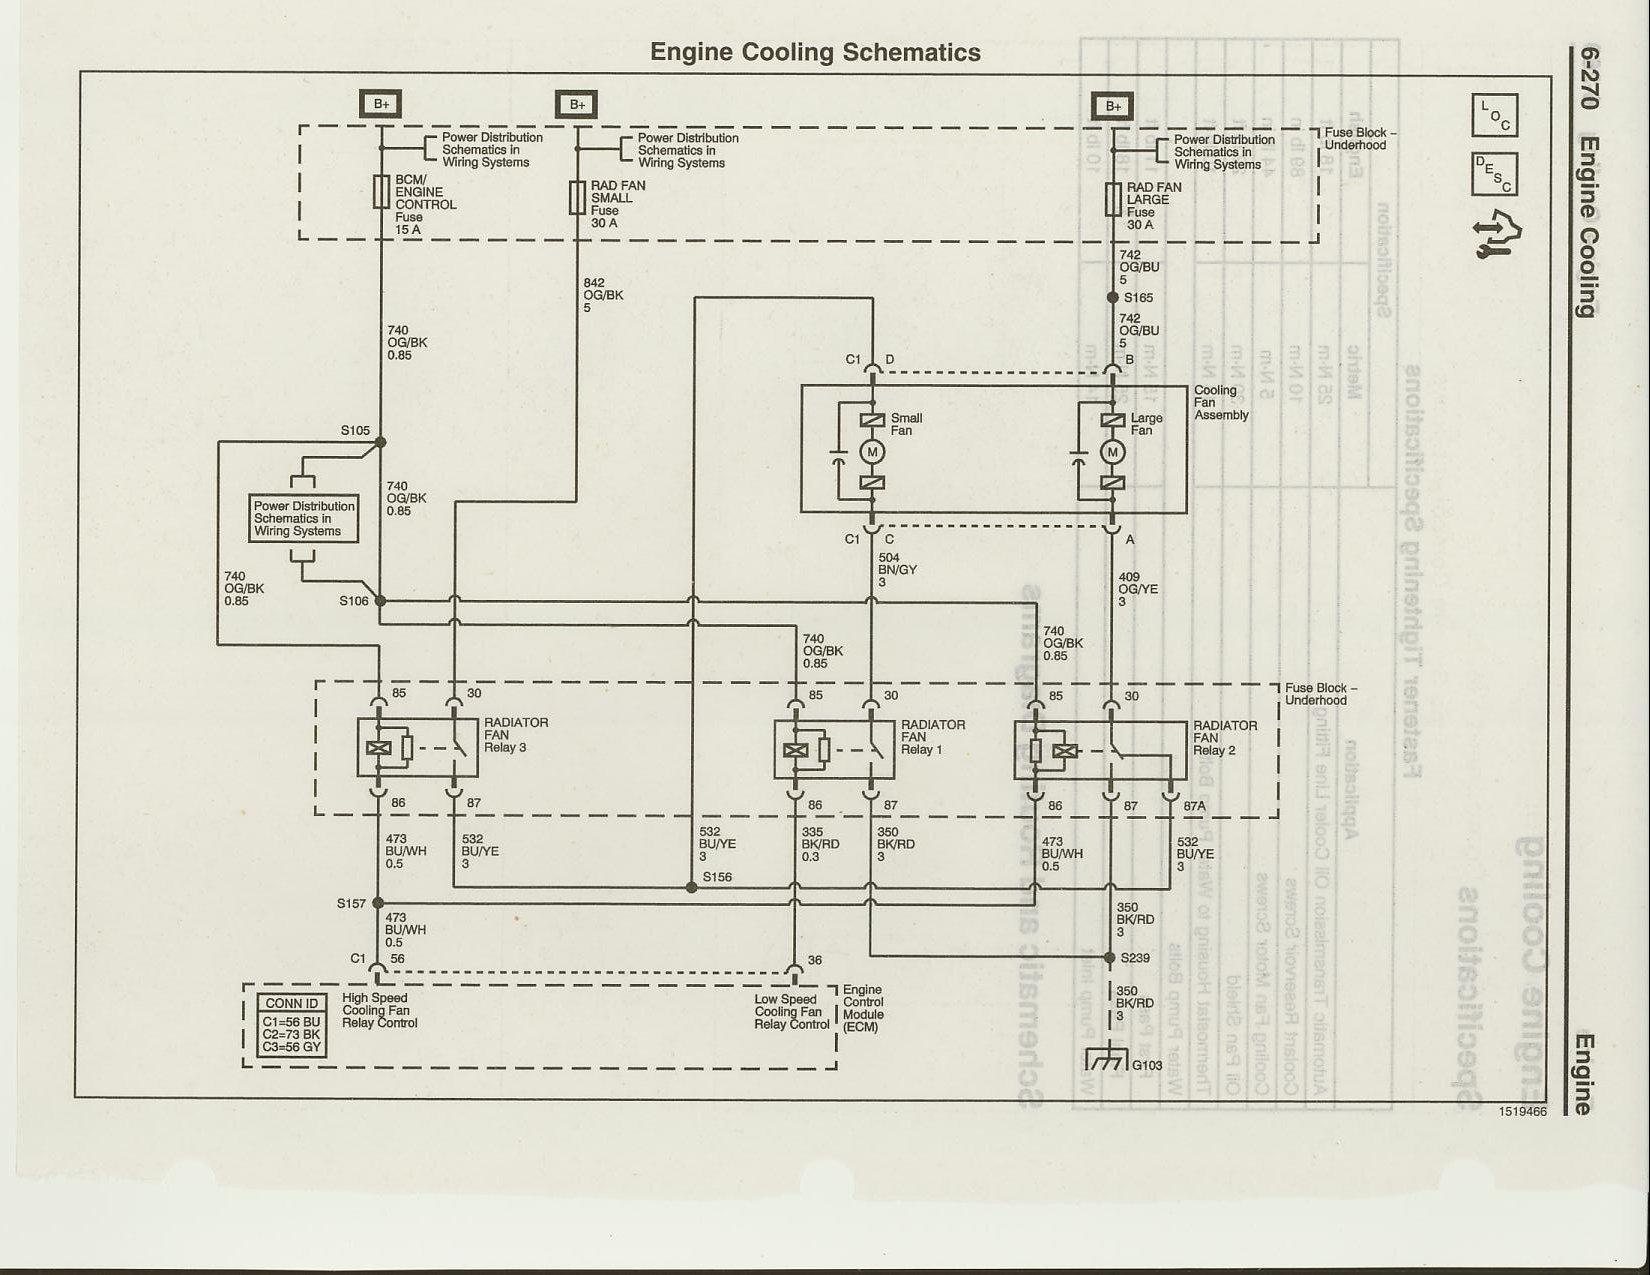 hight resolution of 1989 in car wiring schematics third generation fbody message fpwh003jpg 9397 lt1 fbody racetronix fuel pump wiring harness